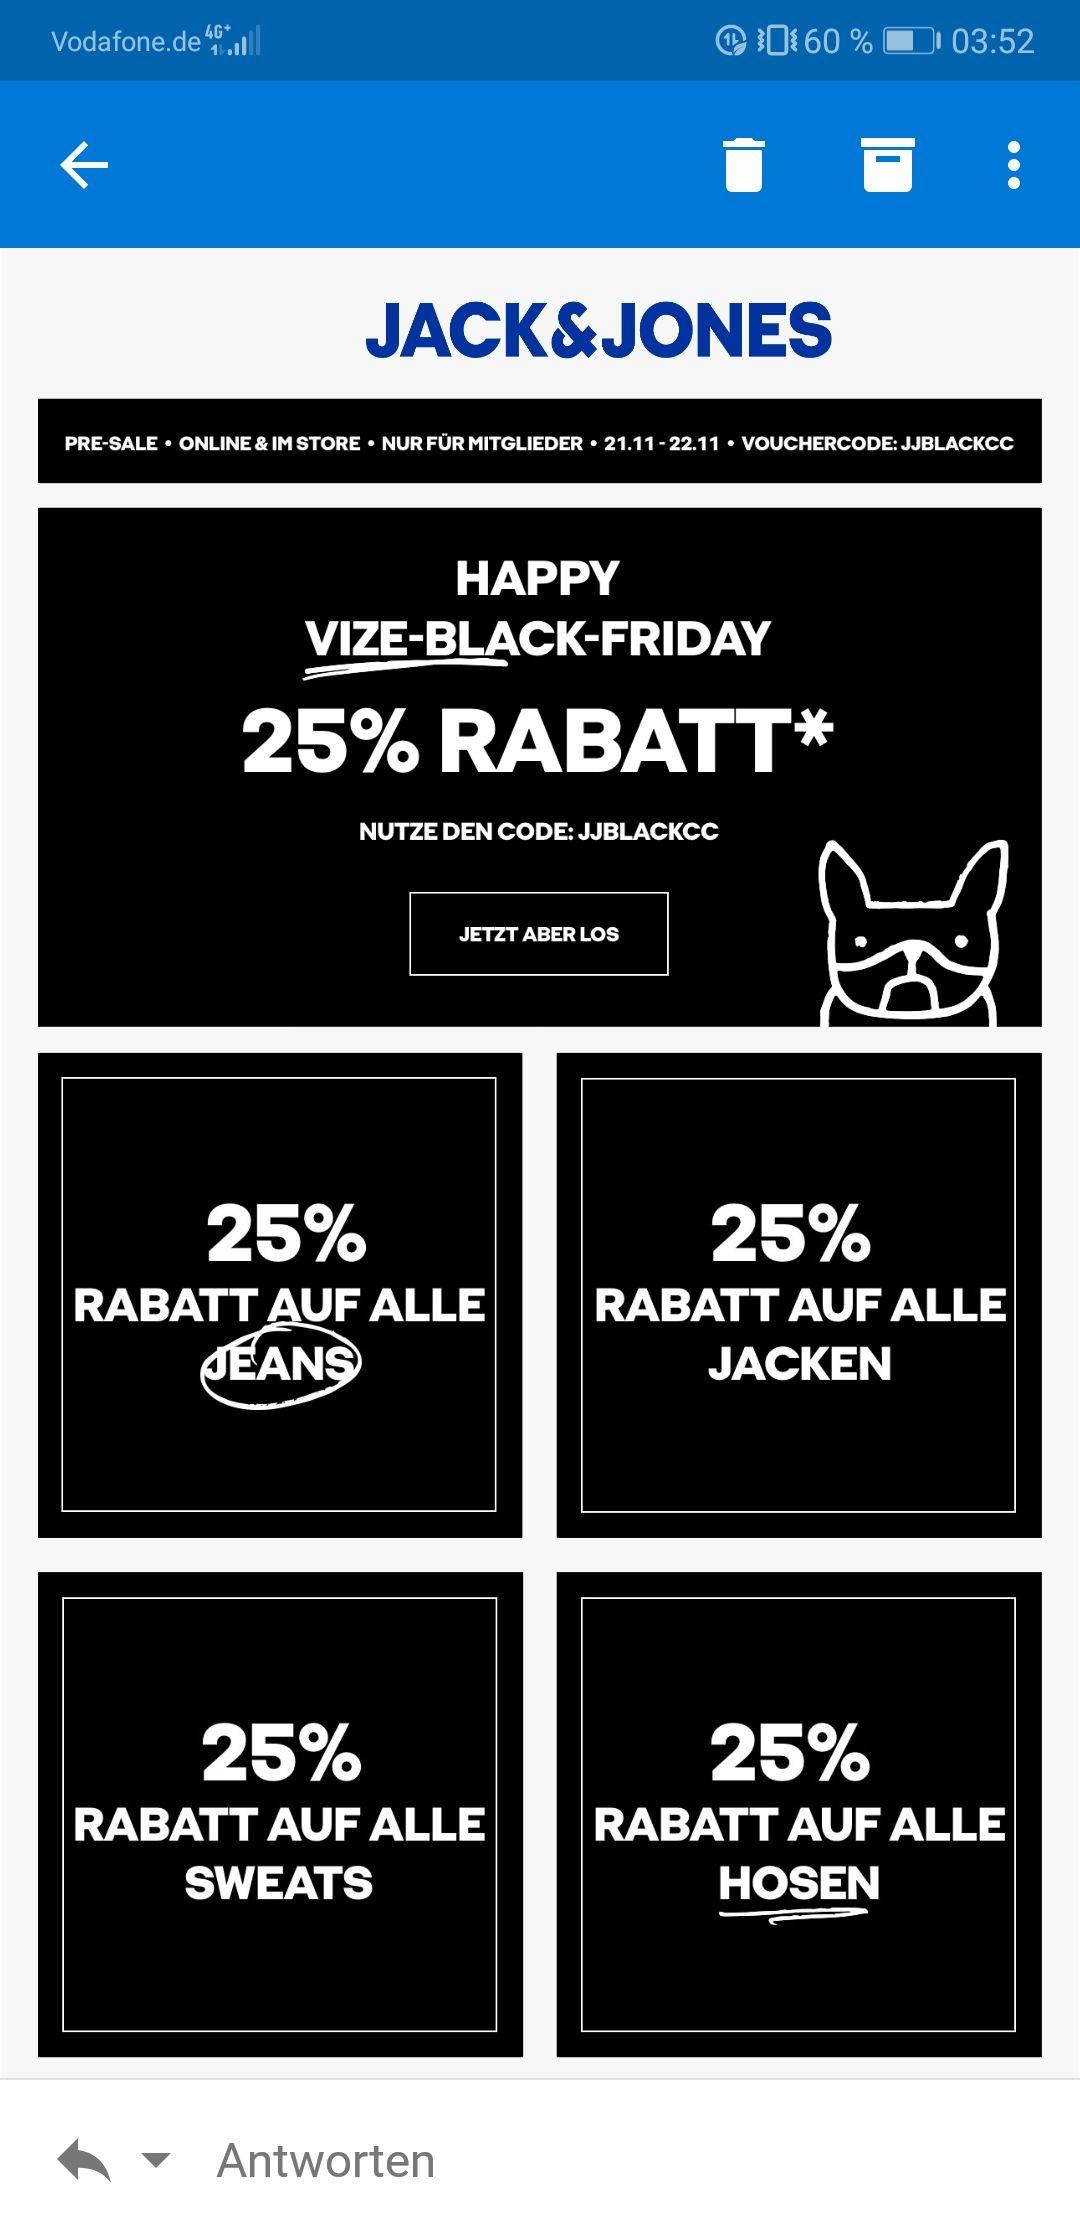 Jack & Jones (BF) 25% auf Jeans, Jacken, Sweats & Hosen